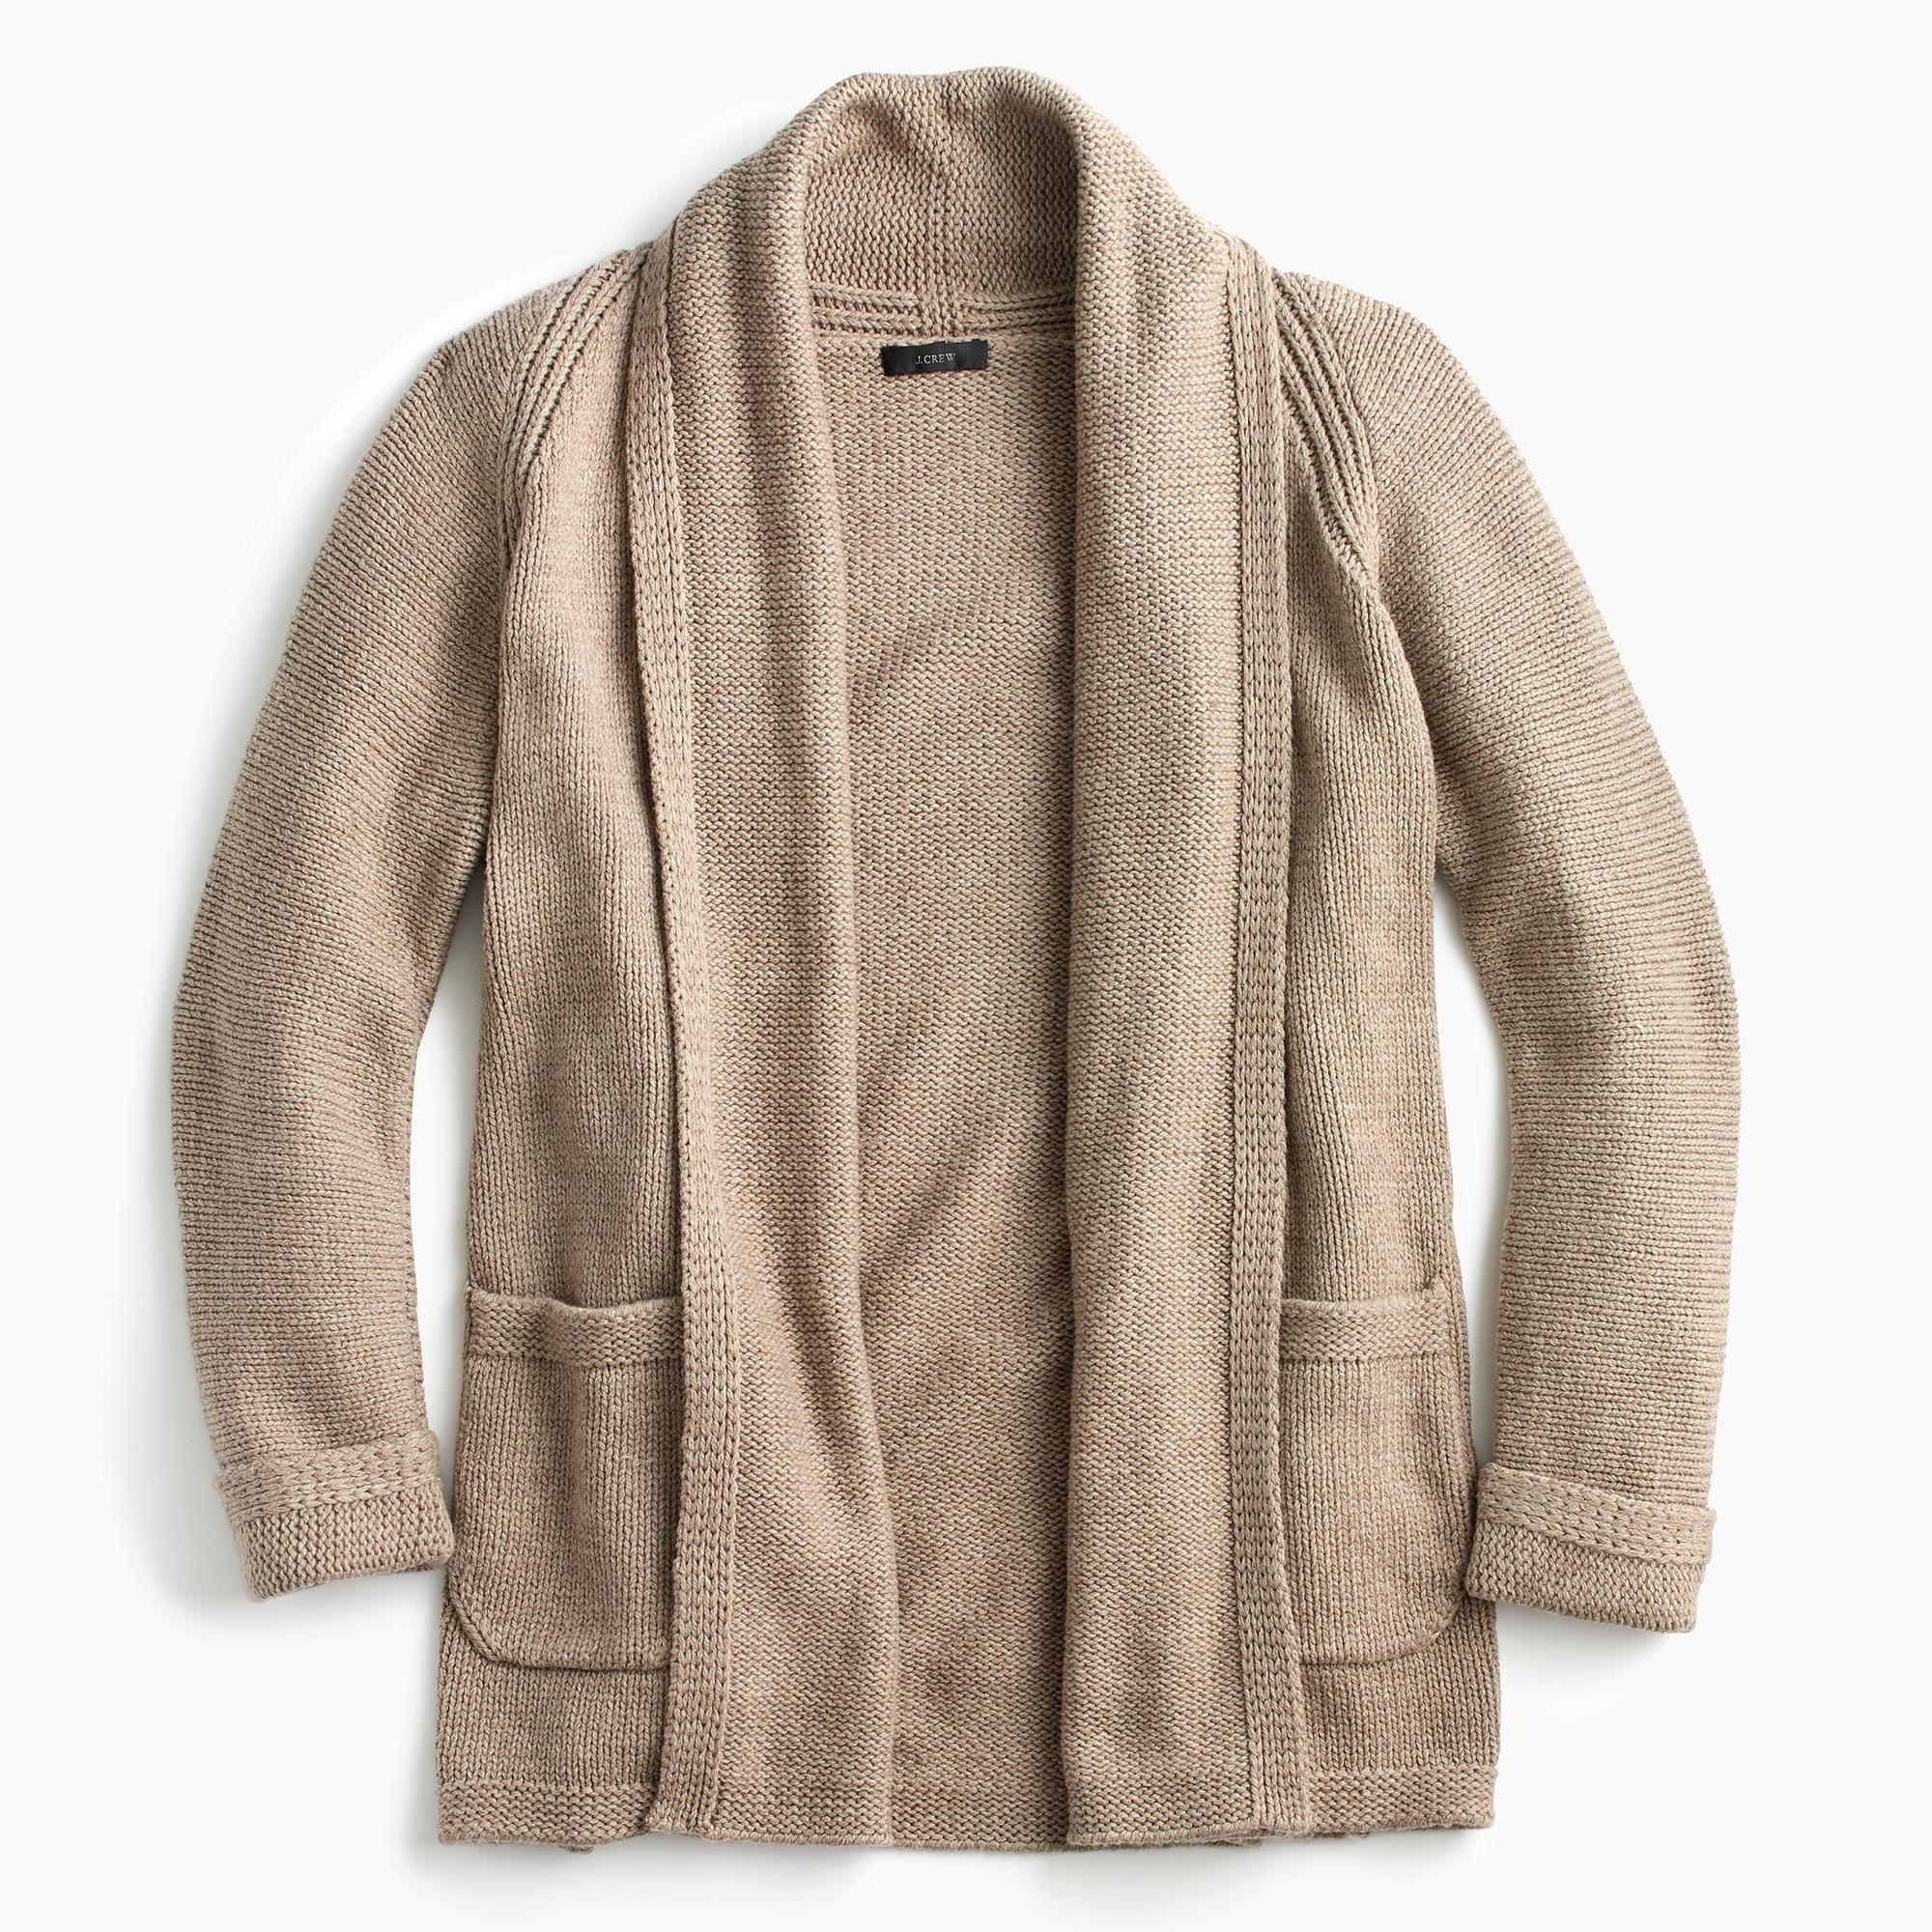 J.crew Long Open Cardigan Sweater | Lyst